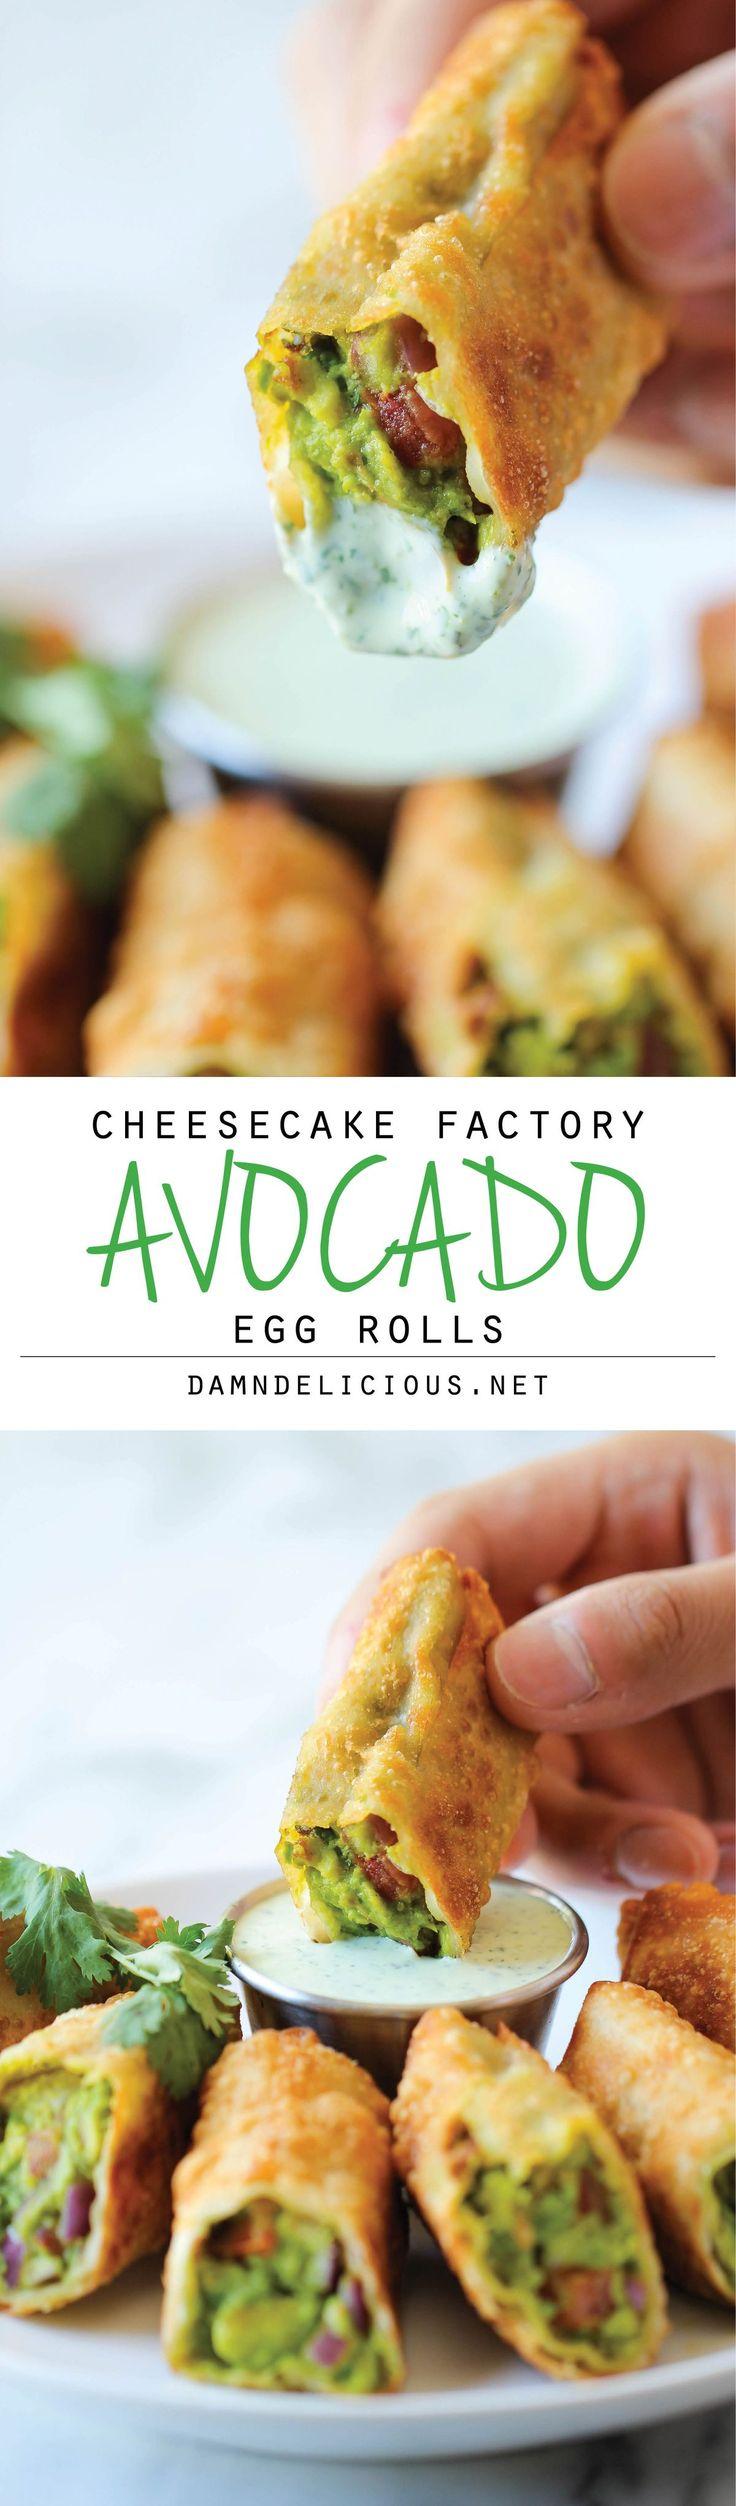 Cheesecake Factory Avocado Egg Rolls